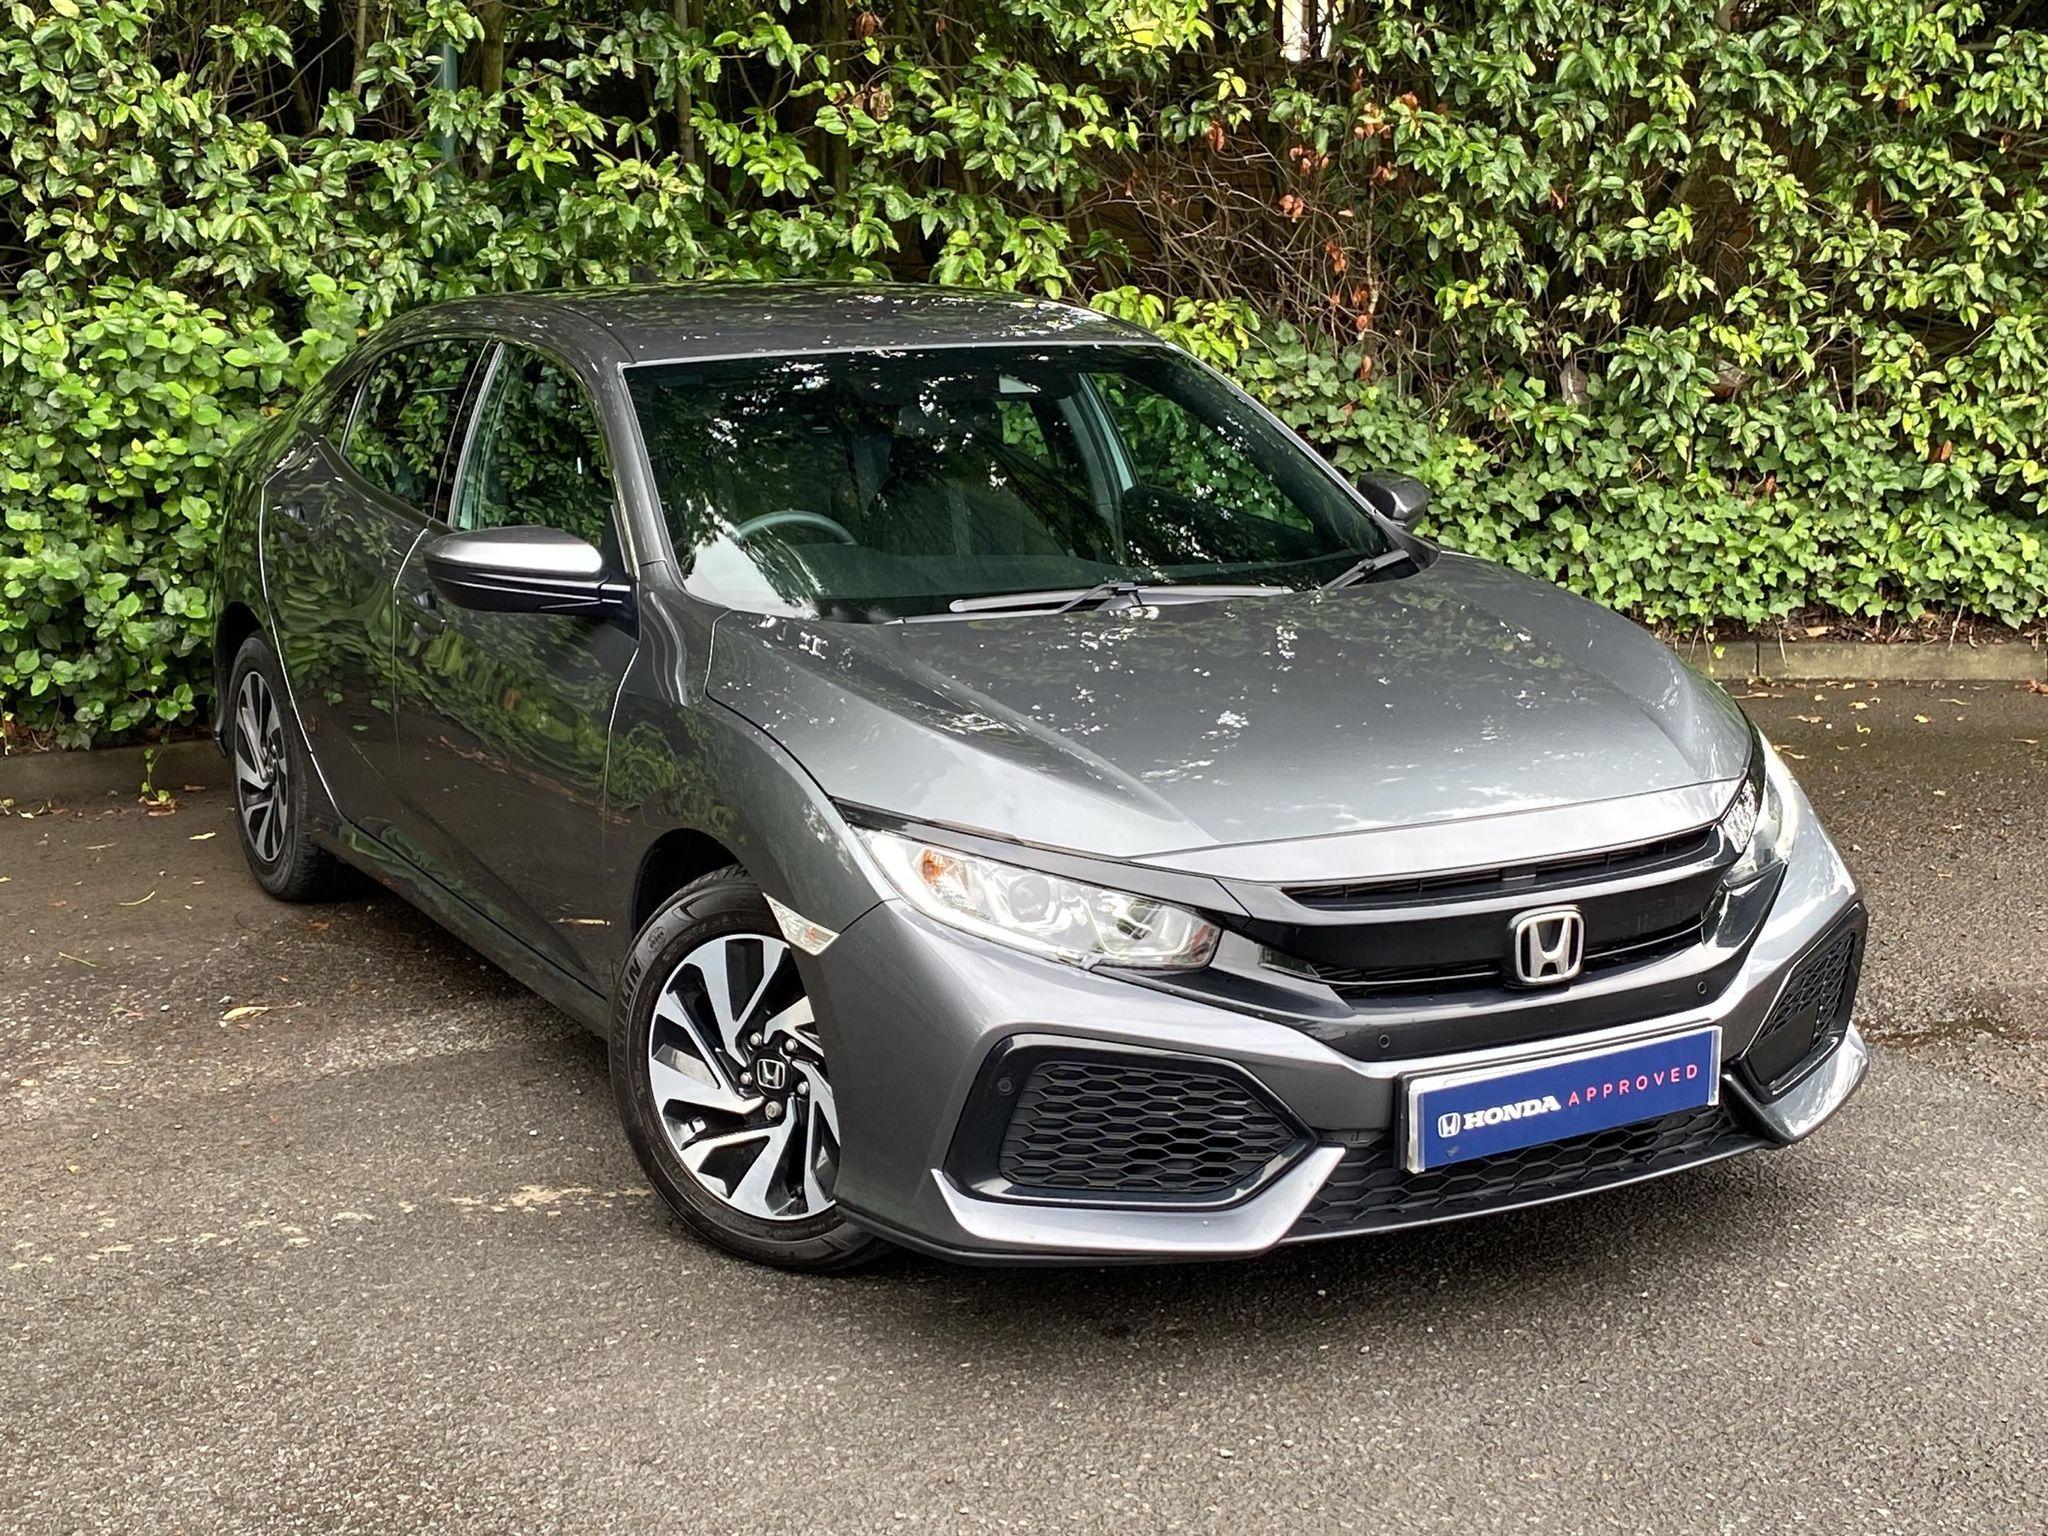 Honda Civic 1.0 VTEC Turbo SE CVT (s/s) 5dr